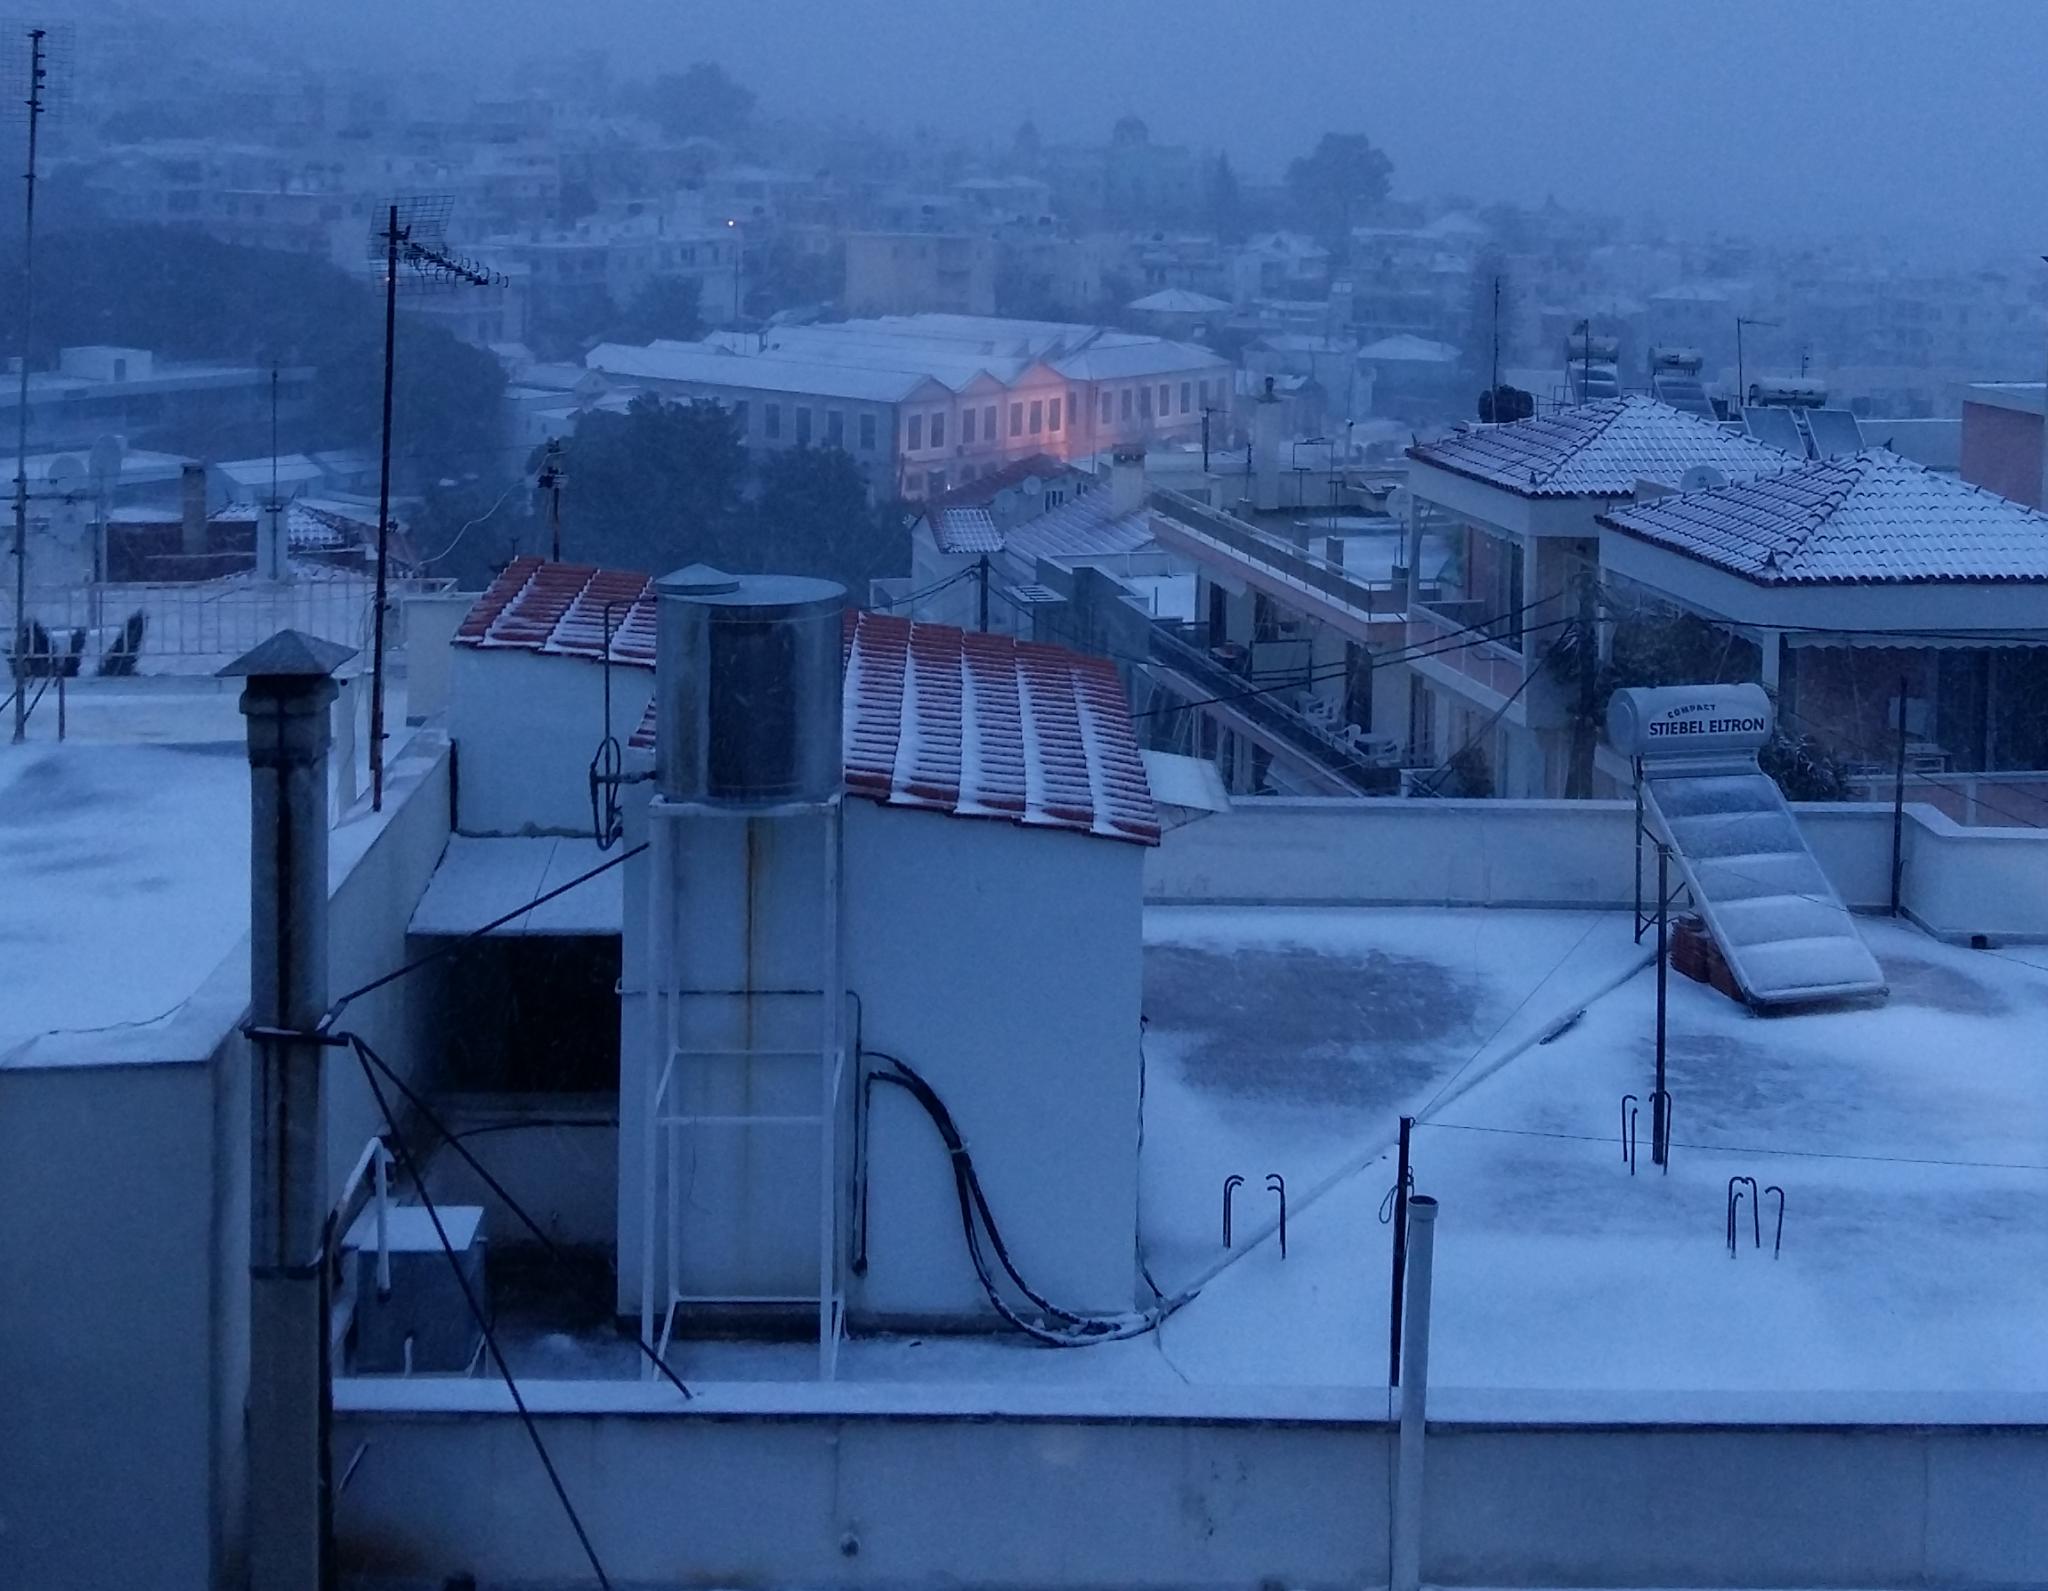 xionia-mytilini Στα «λευκά» η Μυτιλήνη - Σφοδρή η χιονόπτωση σε όλο το νησί